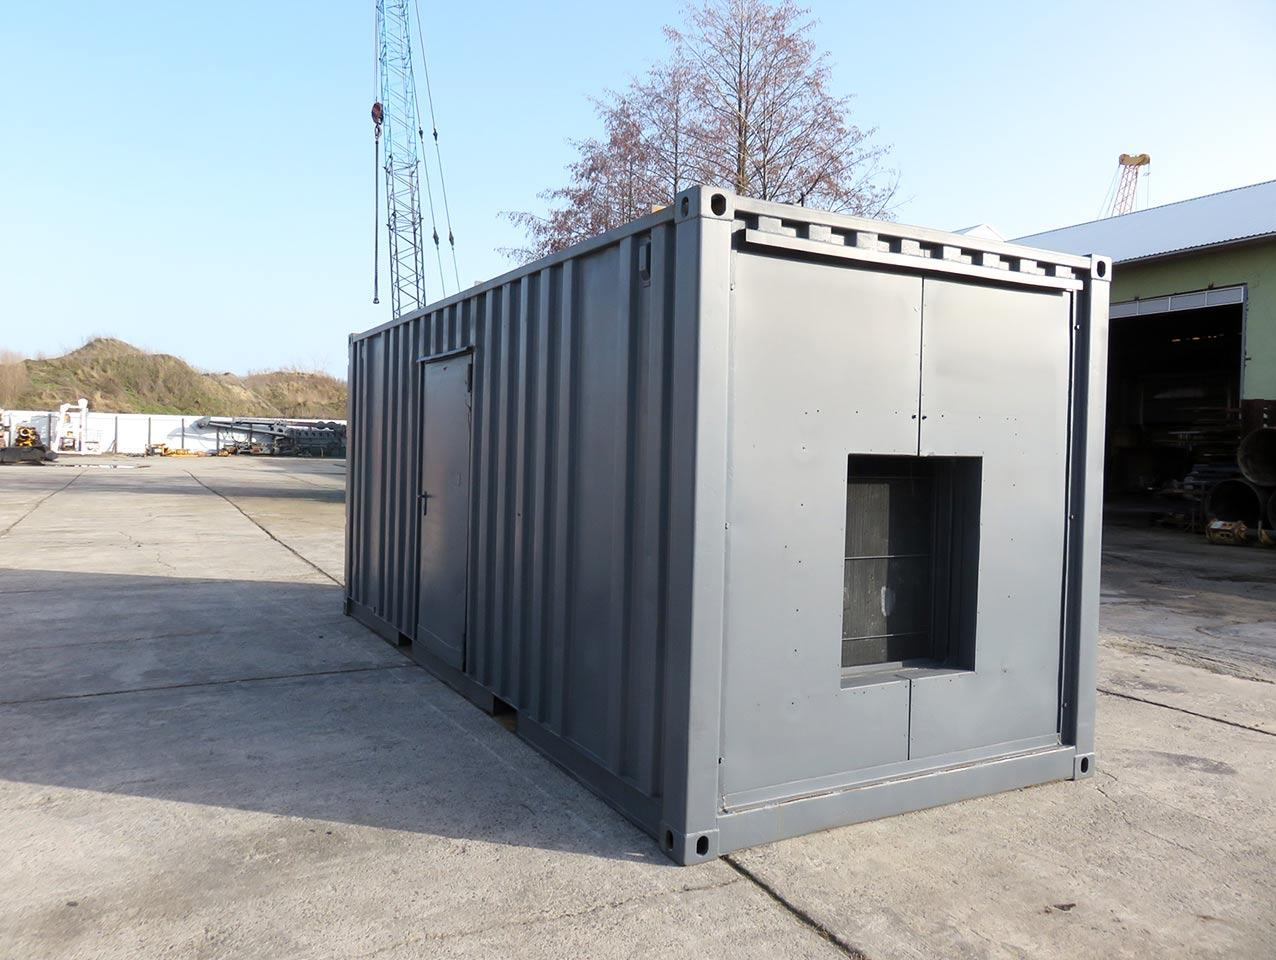 VEM generator rear view